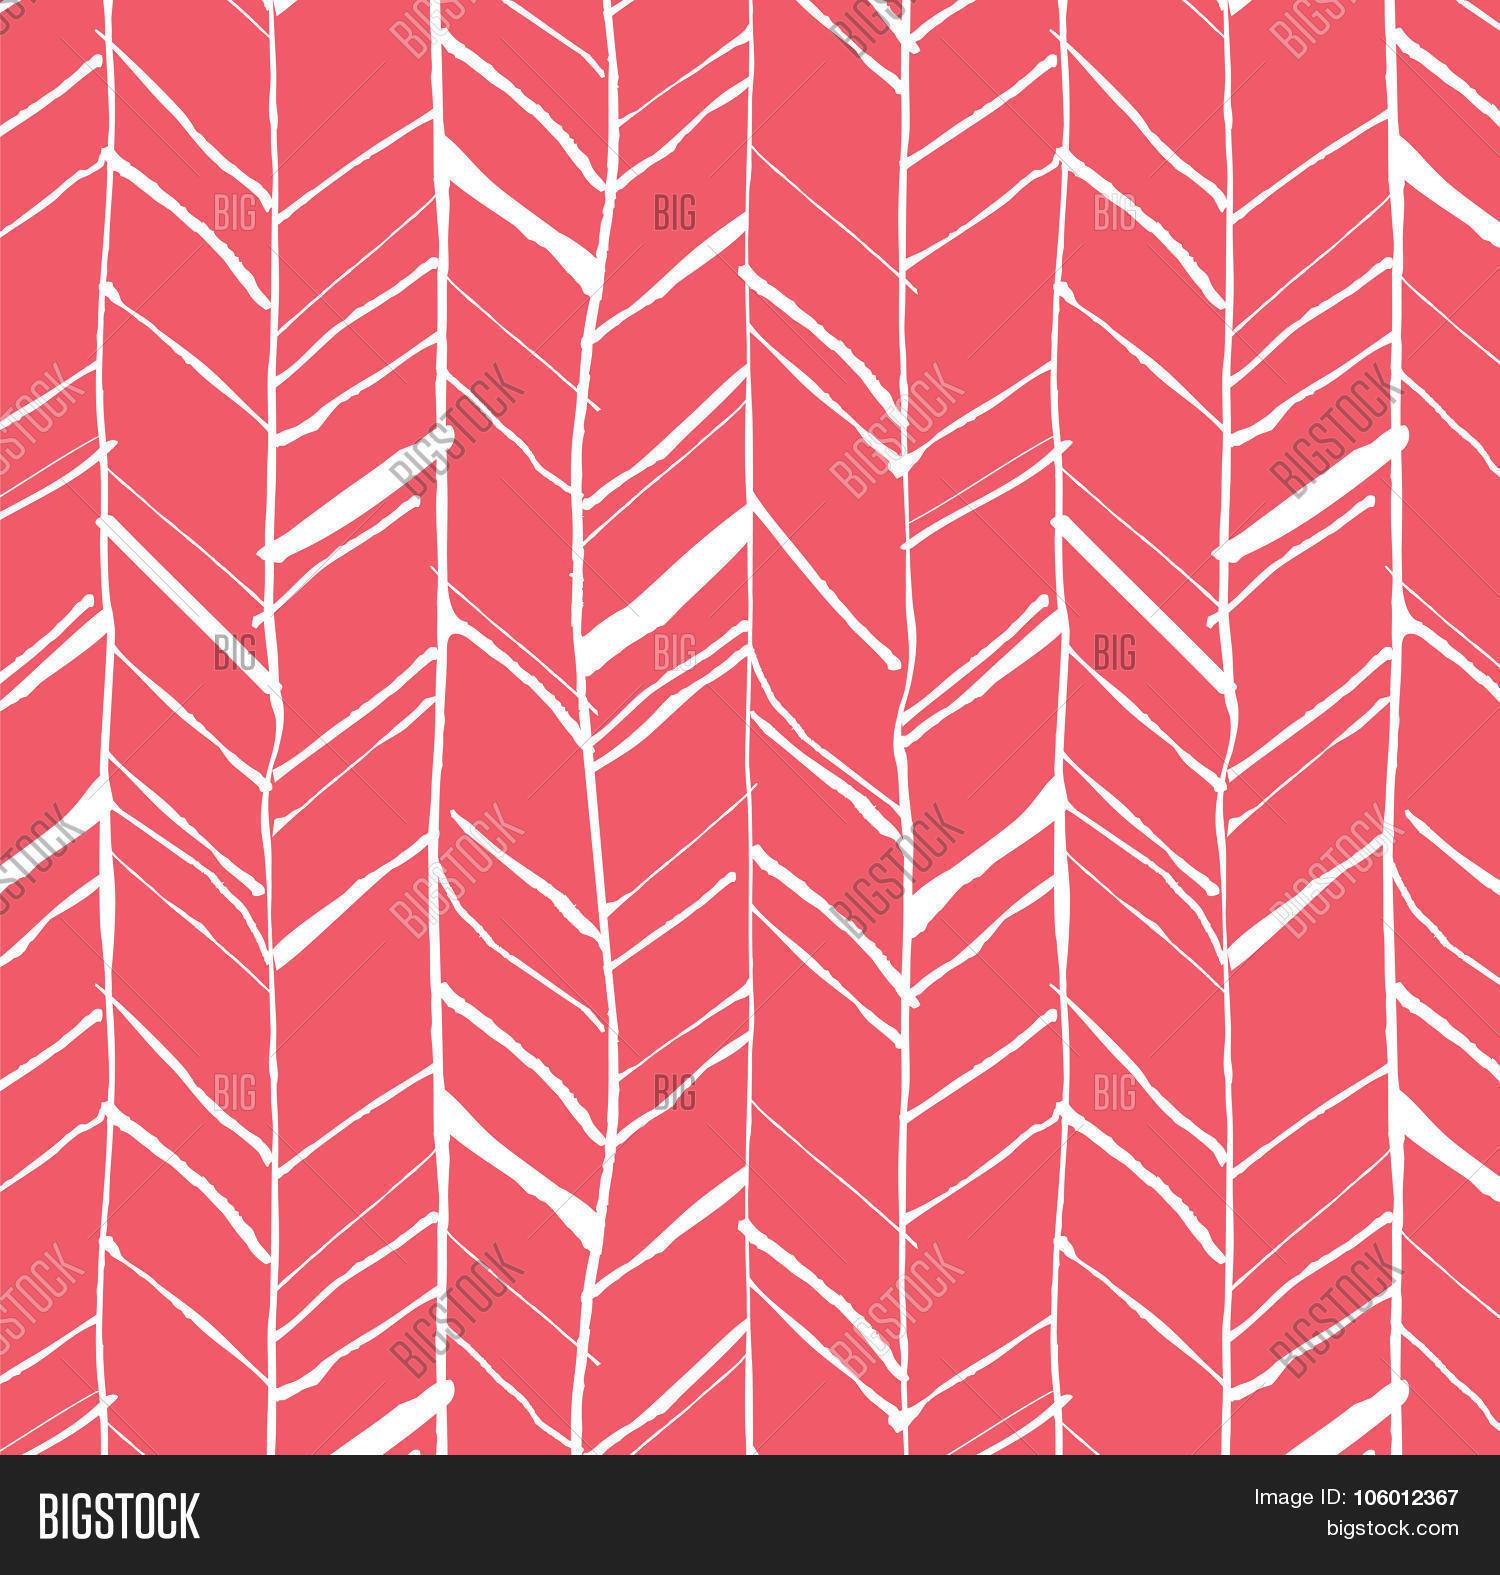 Herringbone pattern